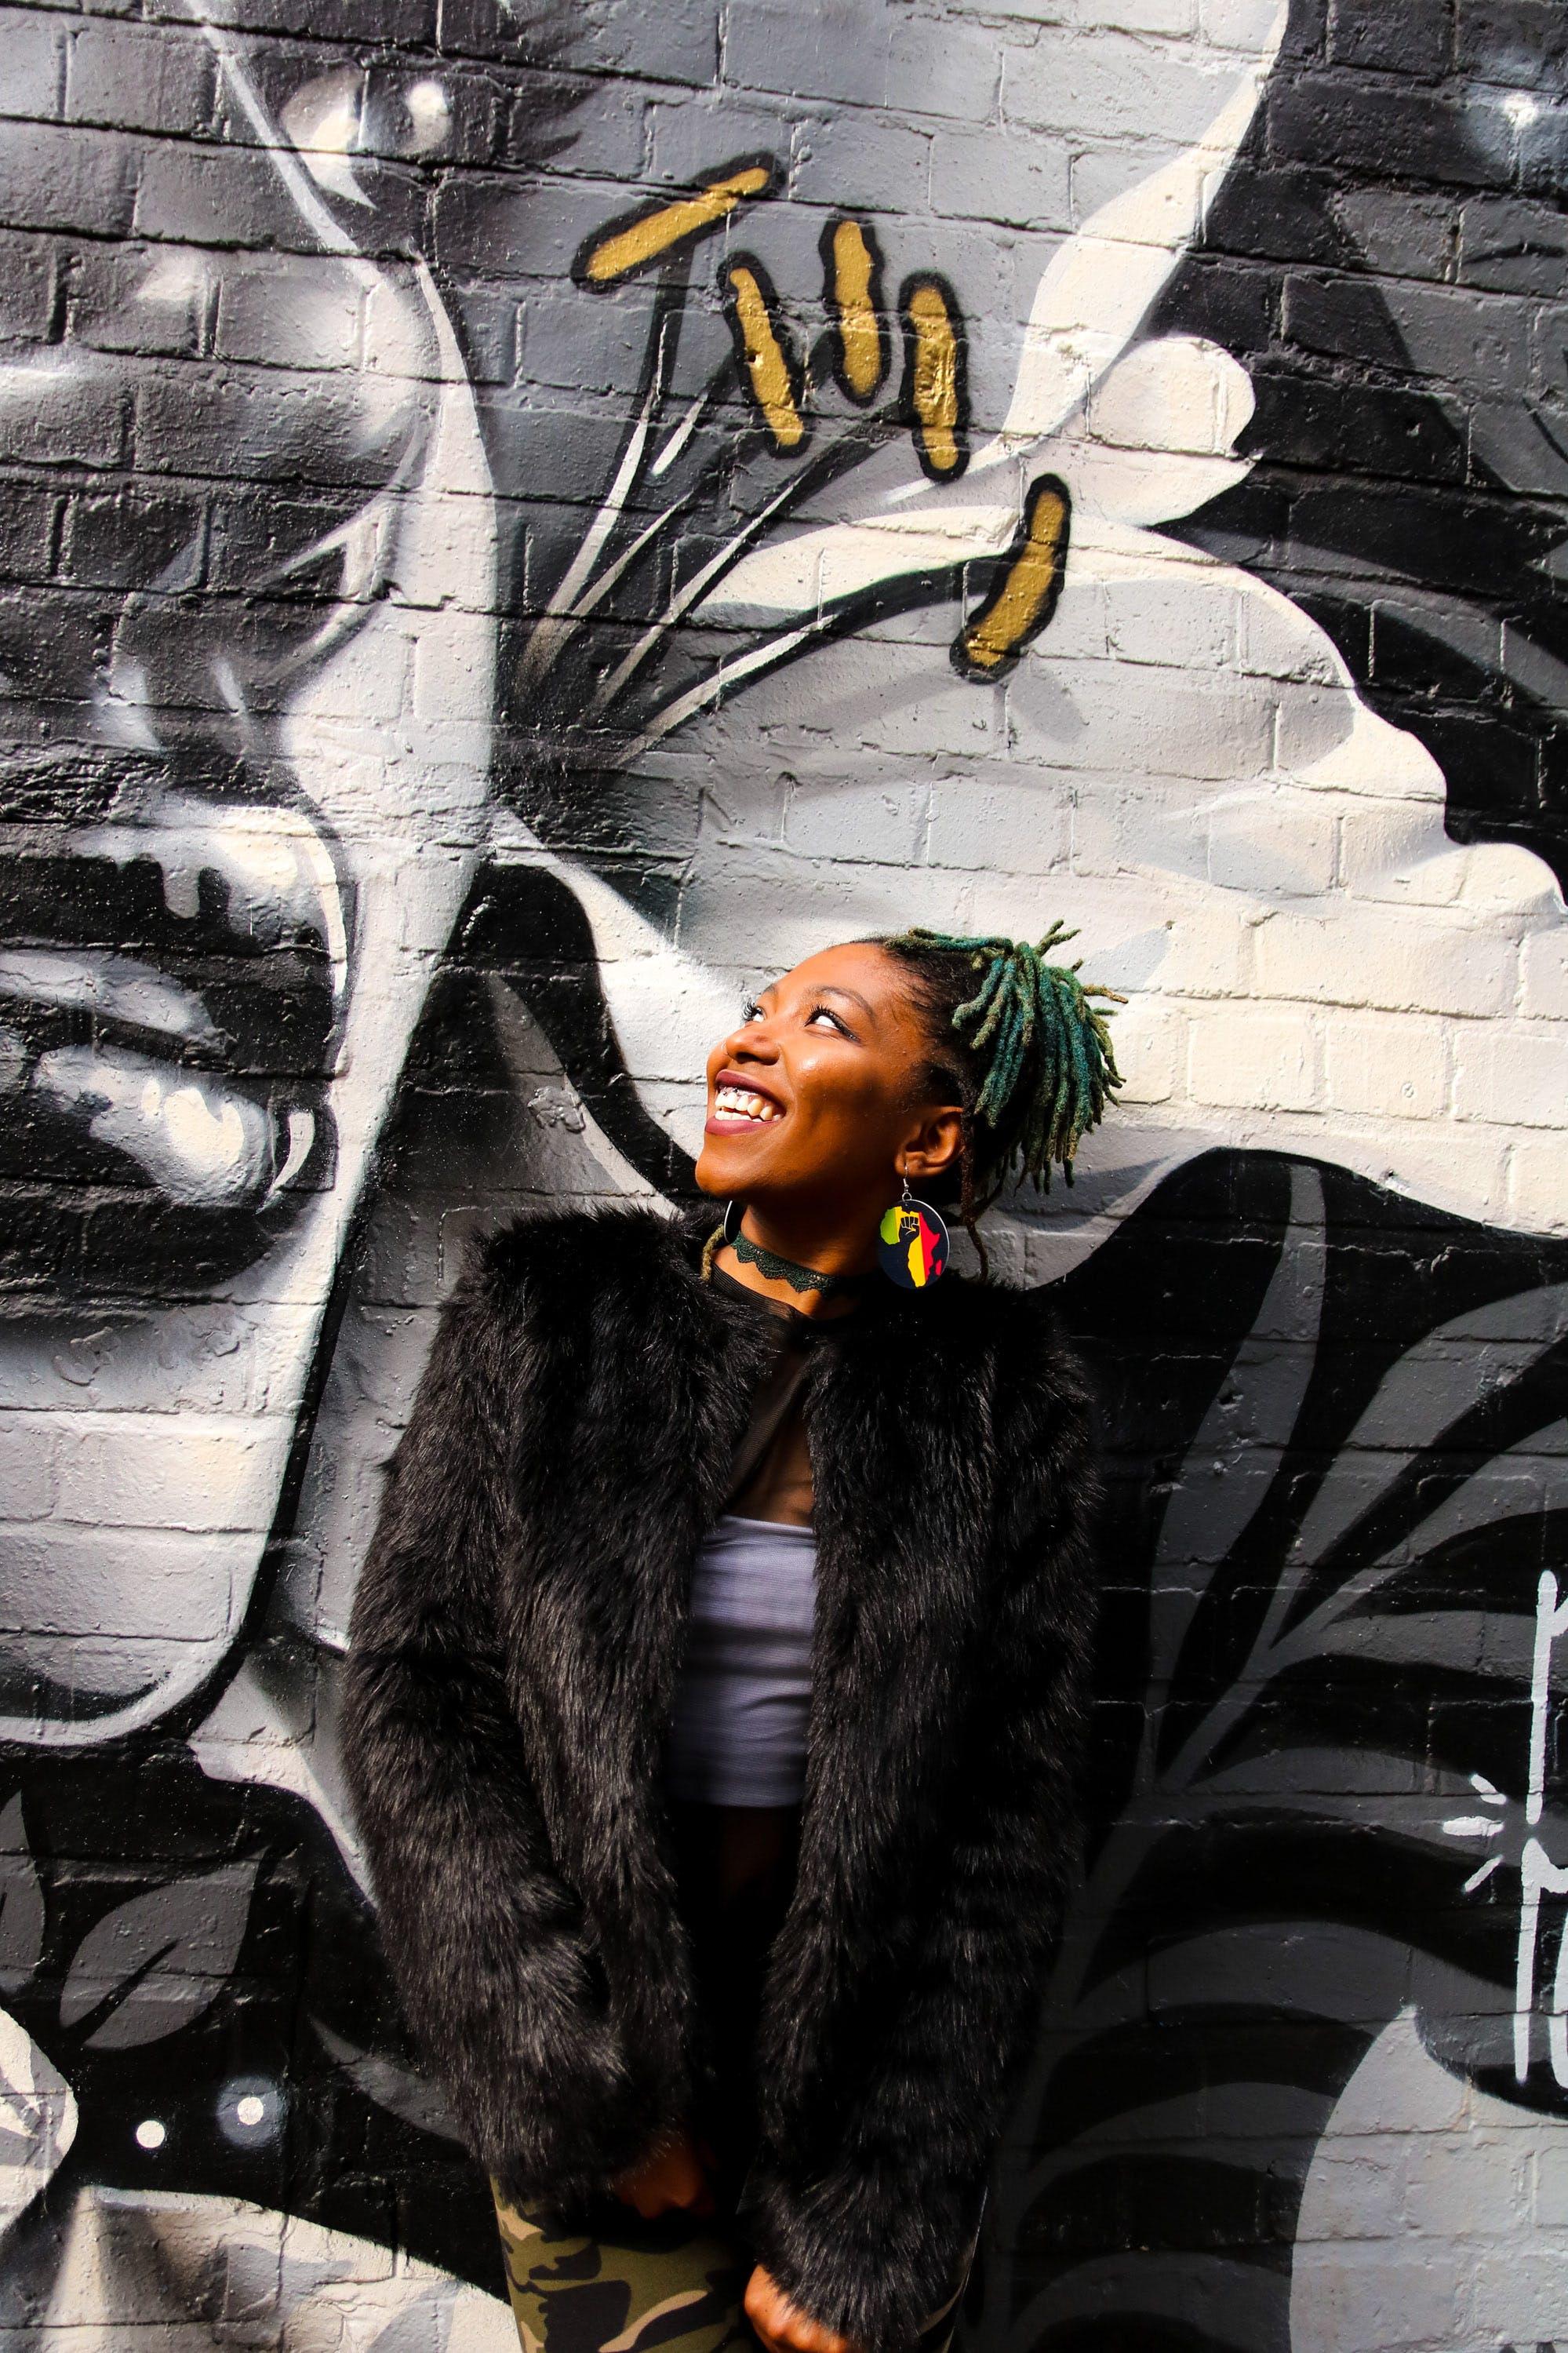 Kostenloses Stock Foto zu afrikanische frau, afroamerikaner-frau, fotoshooting, frau